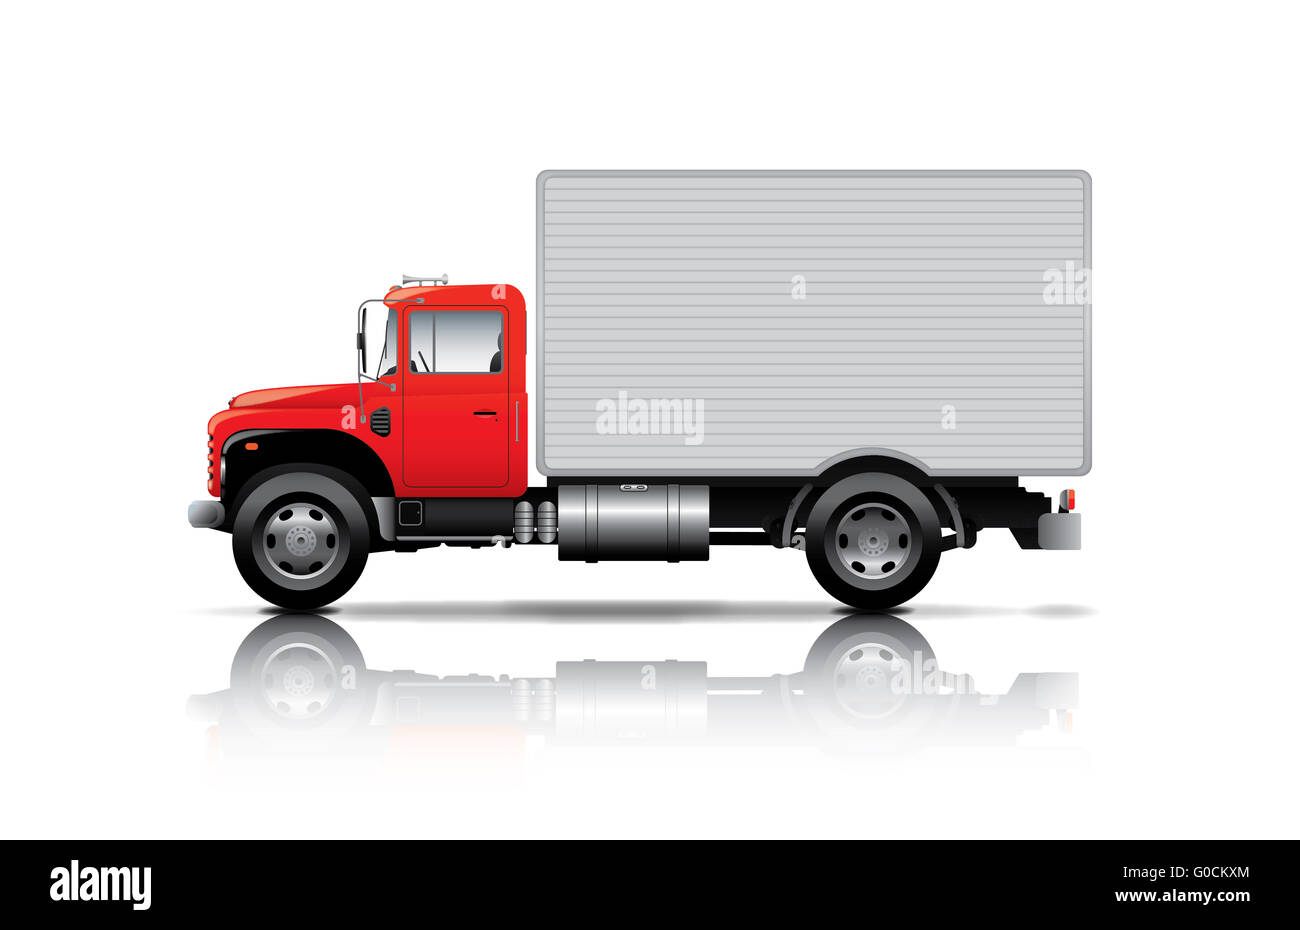 Semi Truck Trailer Van Box Stockfotos & Semi Truck Trailer Van Box ...